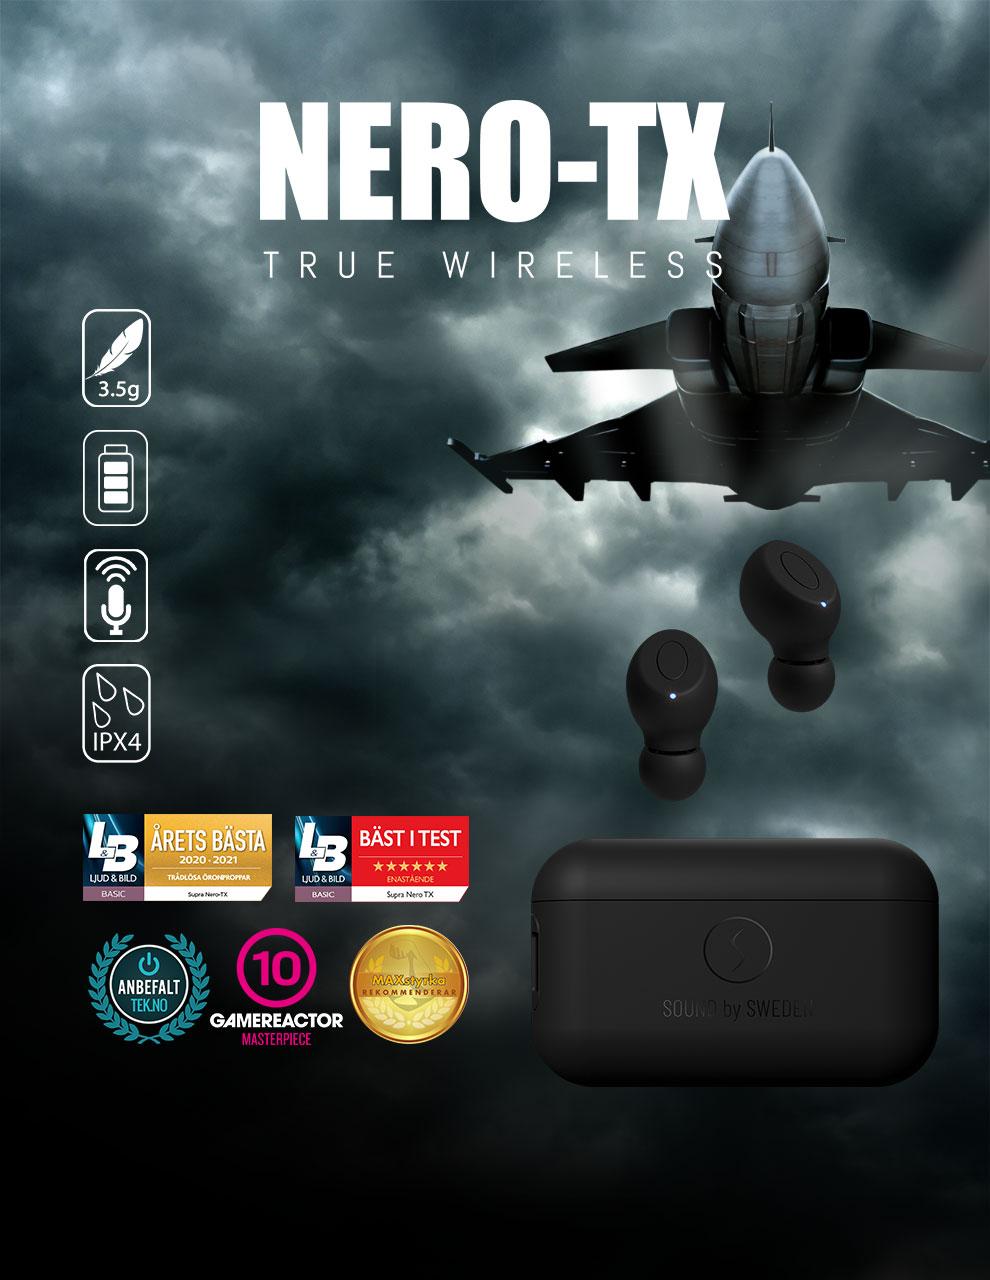 NERO-TX True Wireless